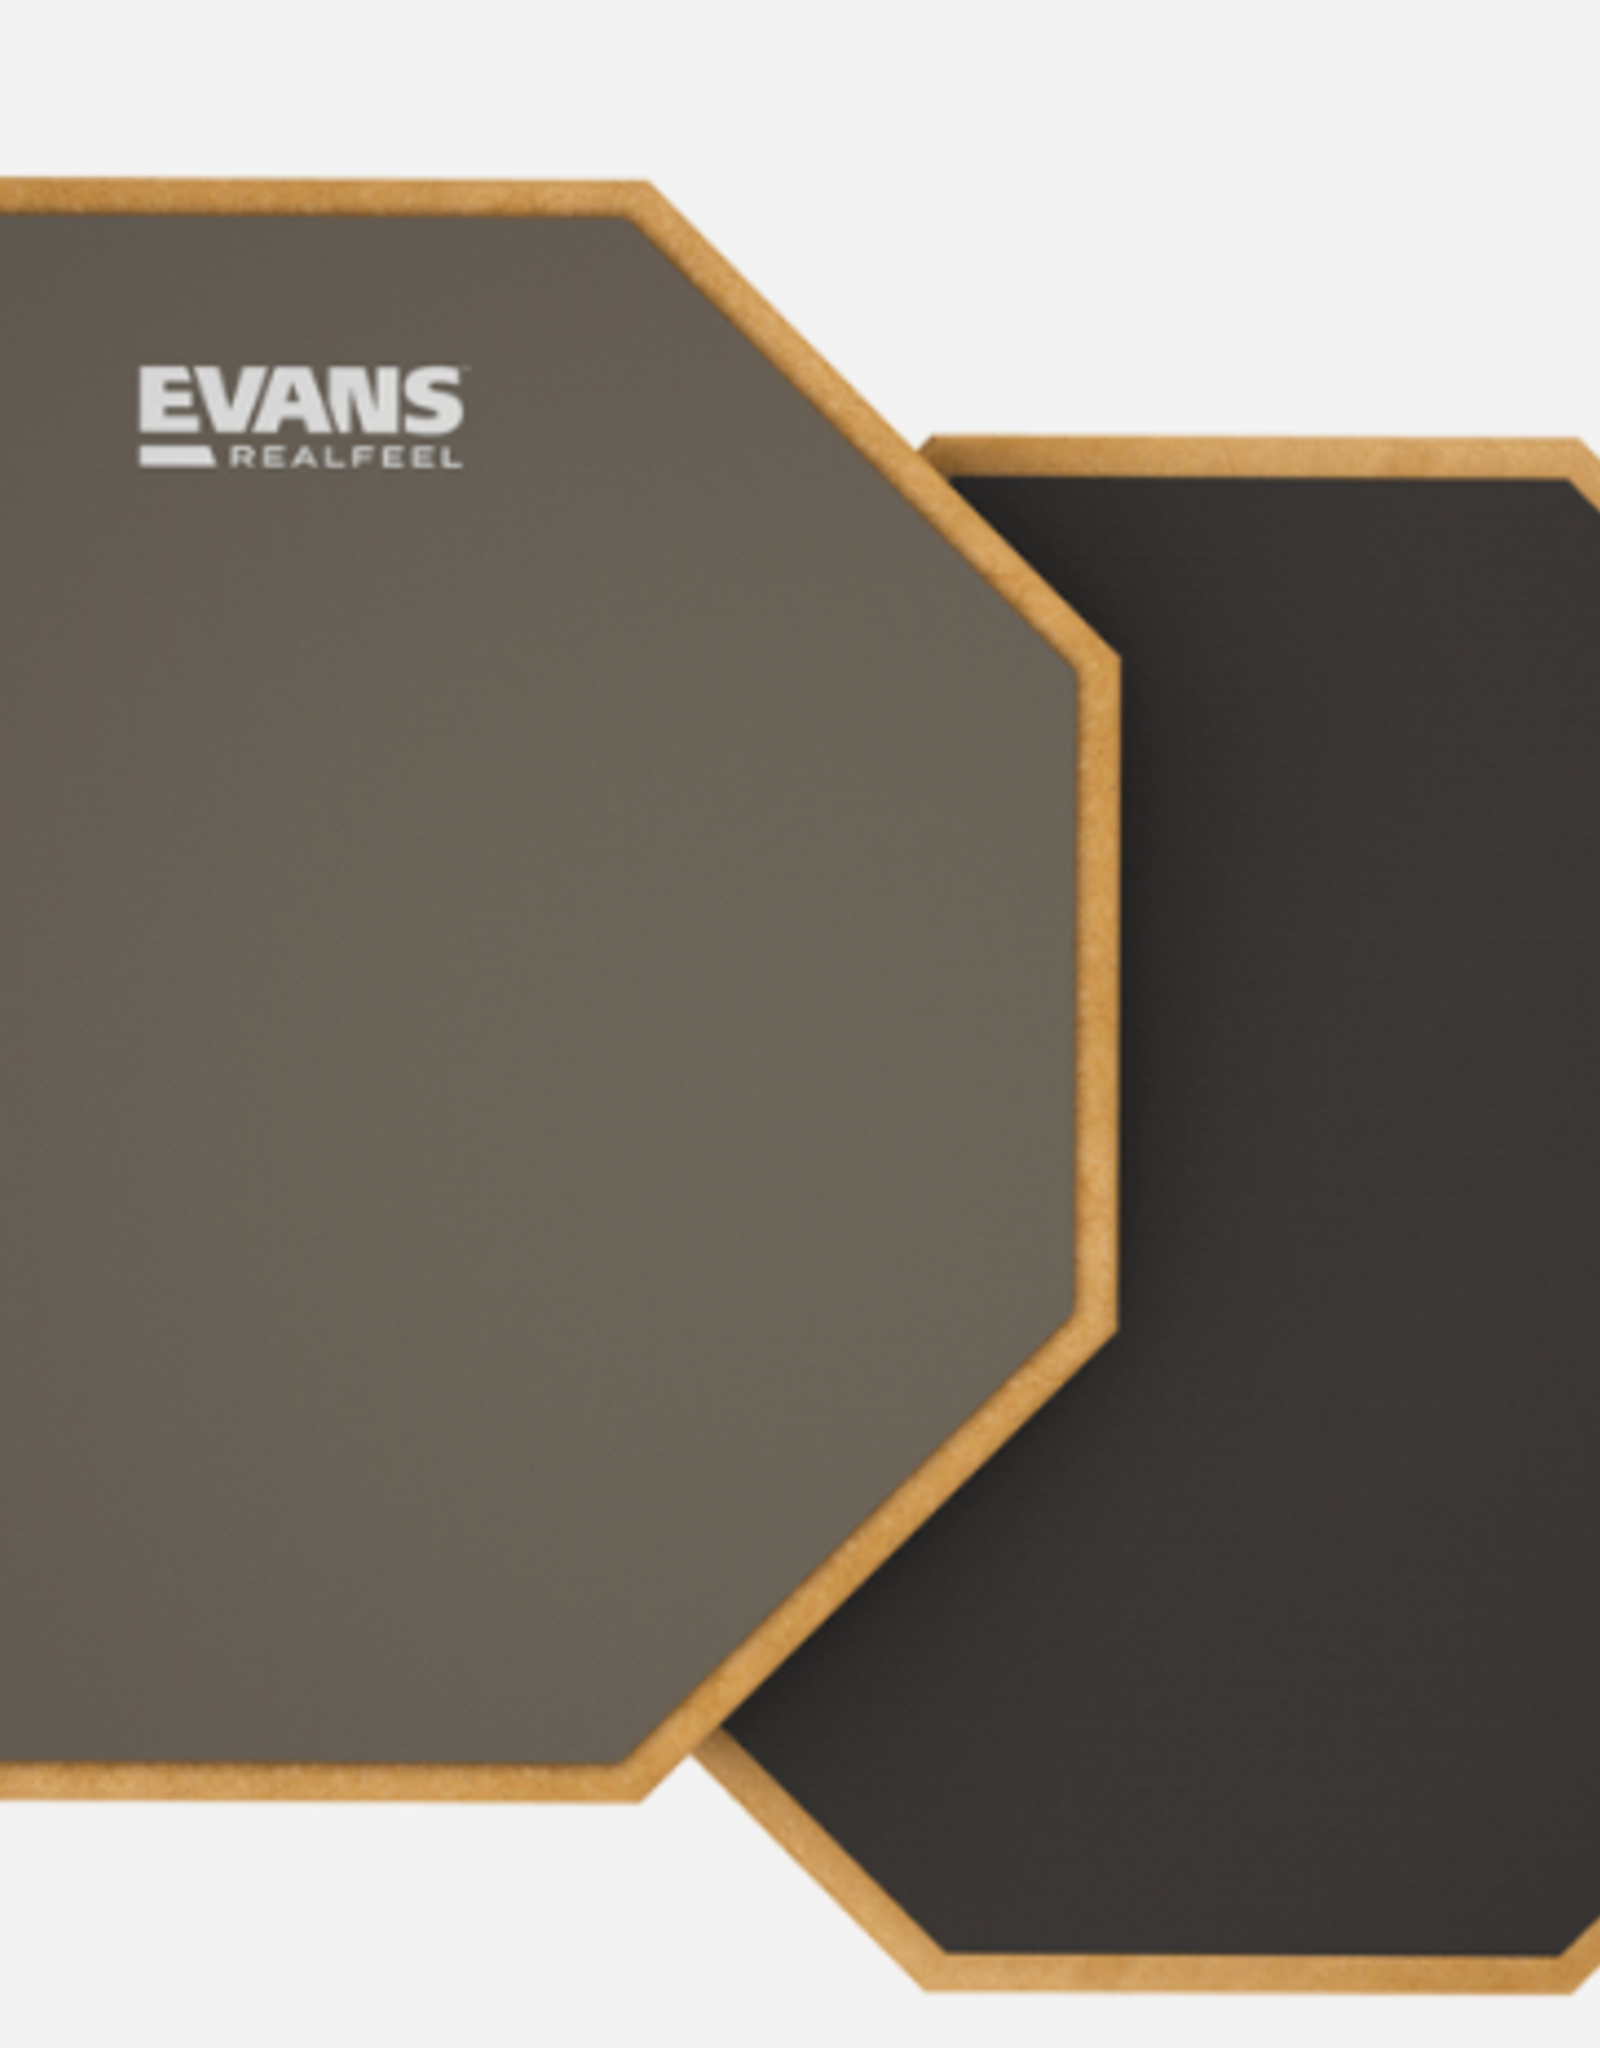 "Evans Accessories Evans 12"" Realfeel Double-sided Practice Pad"